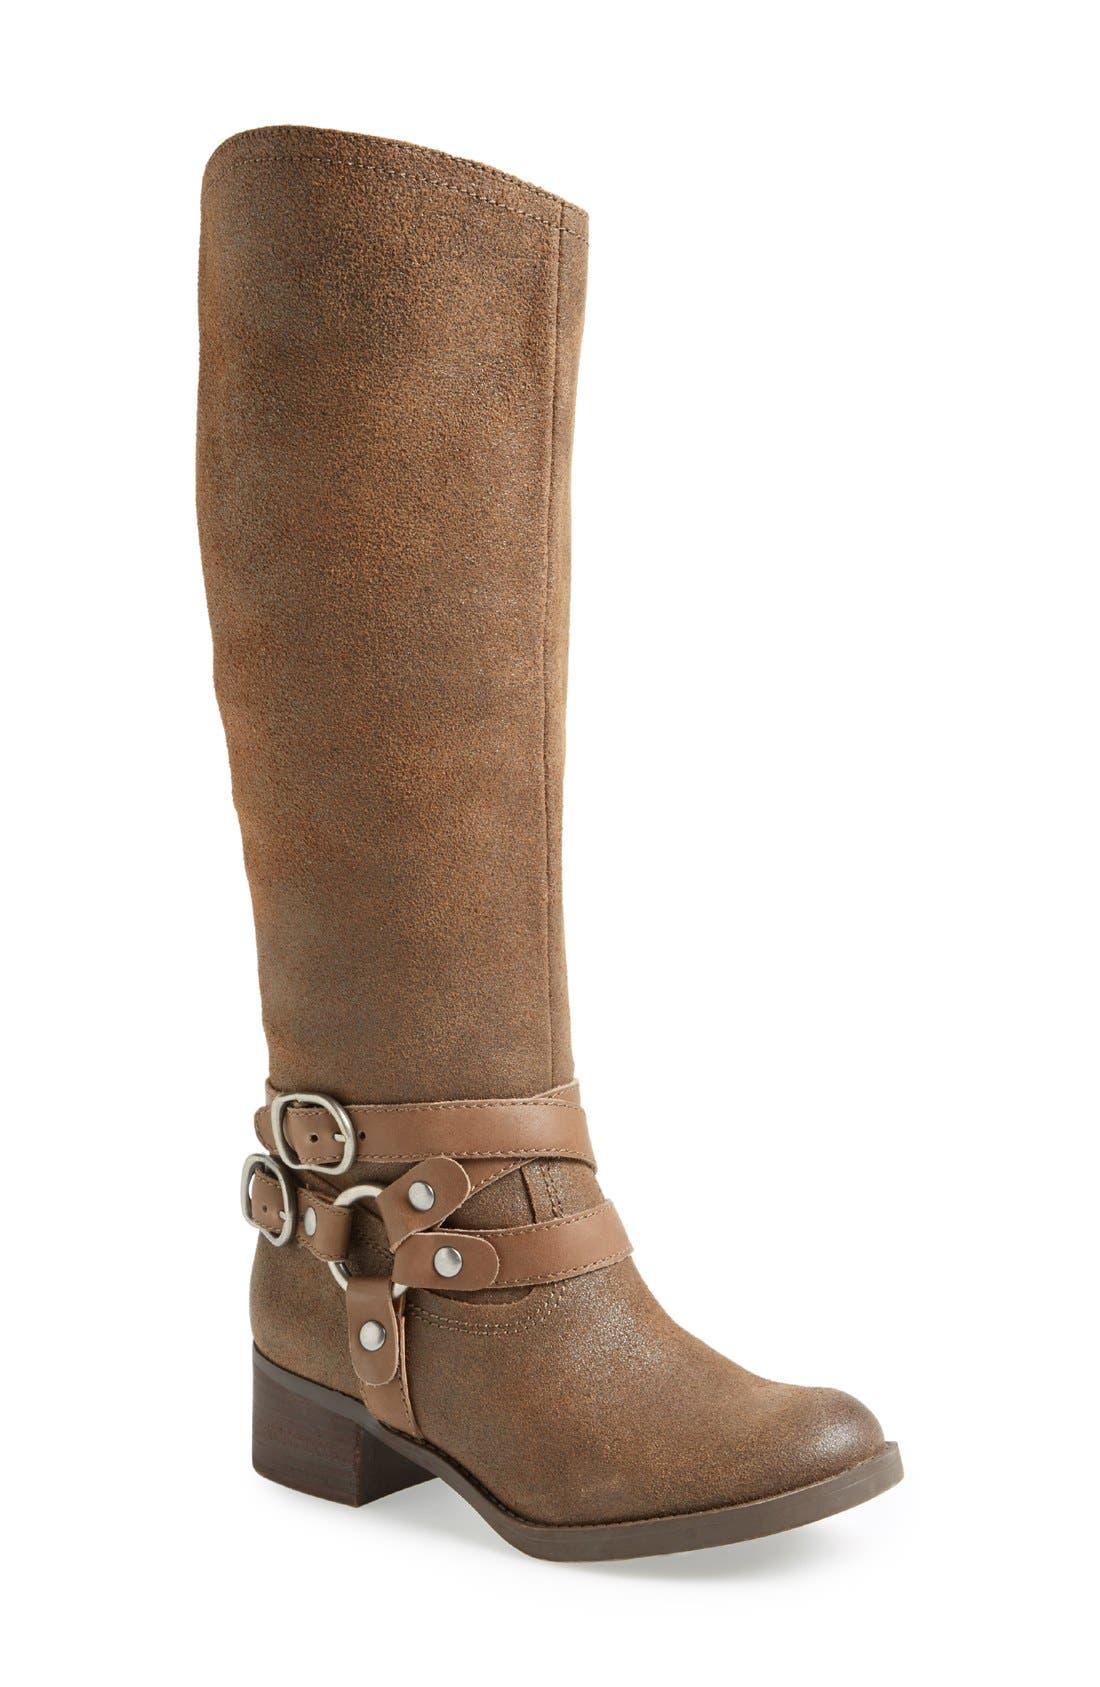 Alternate Image 1 Selected - Lucky Brand 'Hanah' Harness Boot (Women) (Wide Calf)